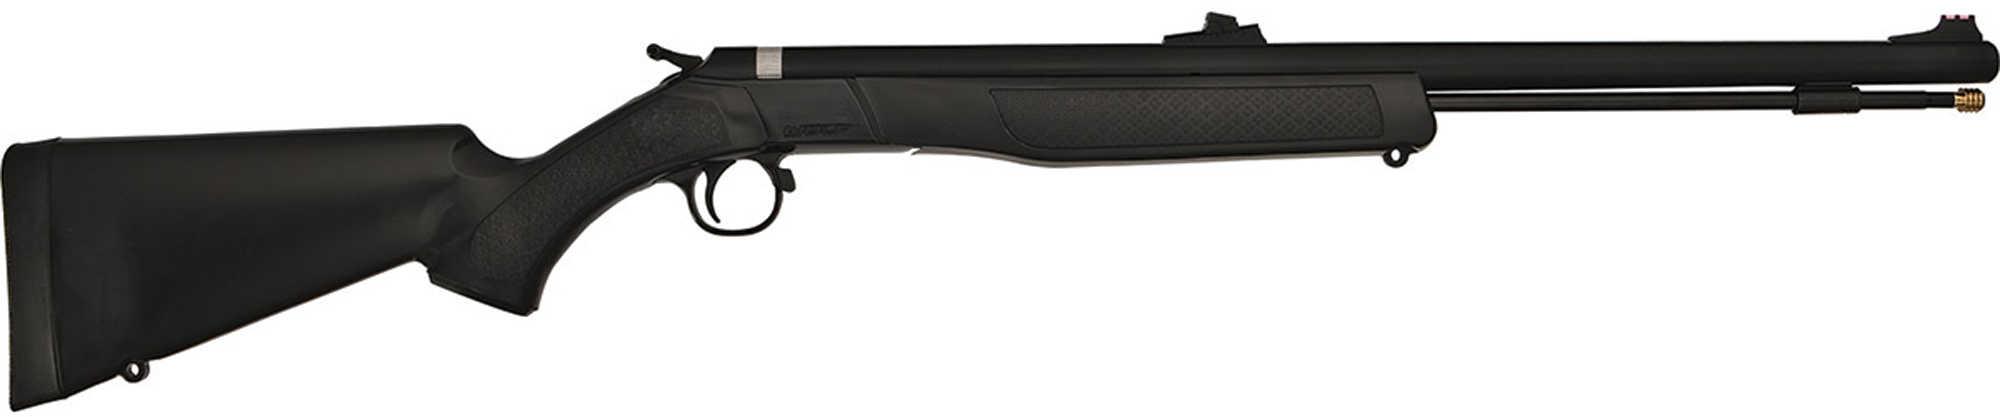 CVA Wolf 50 Caliber Blued/Black Muzzleloader Md: PR2110